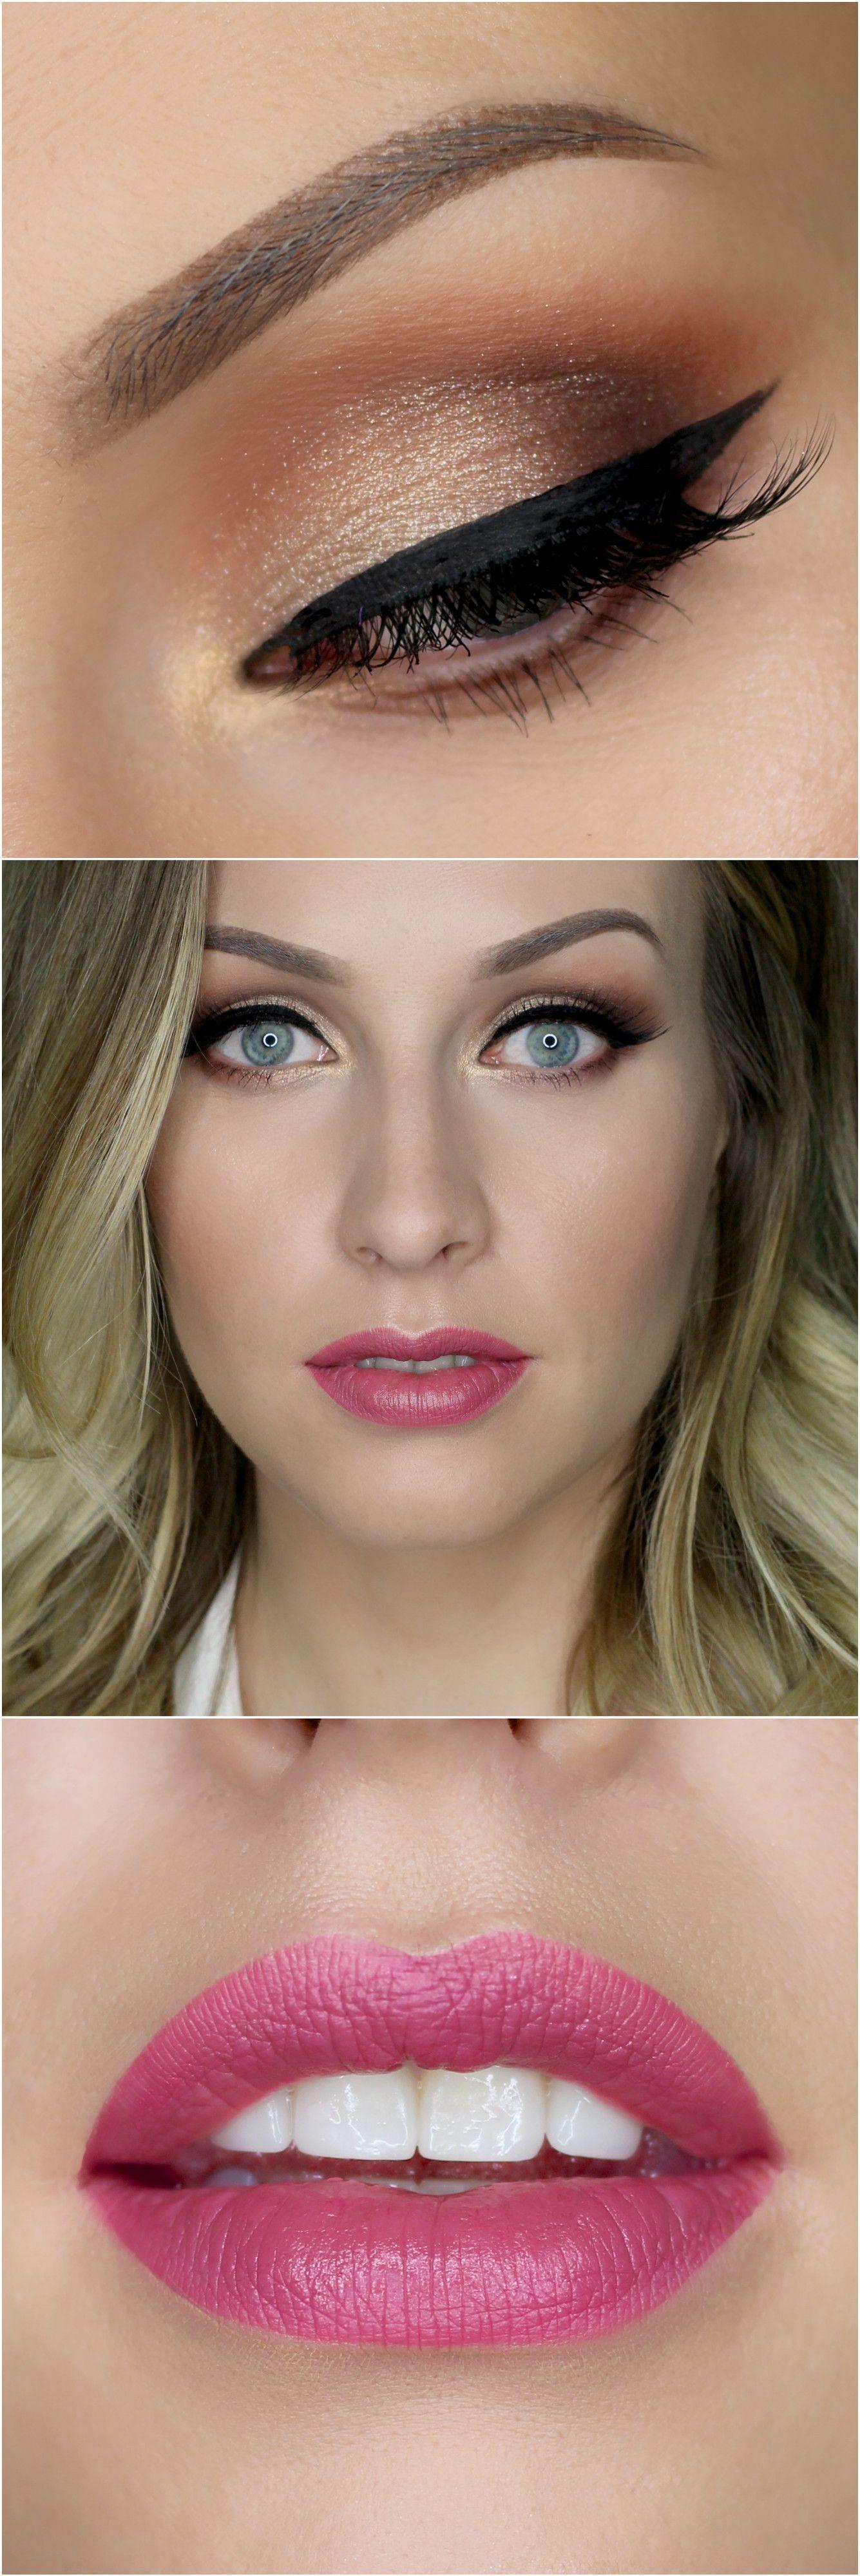 Everyday Fall Makeup Tutorial with Video! Fall makeup